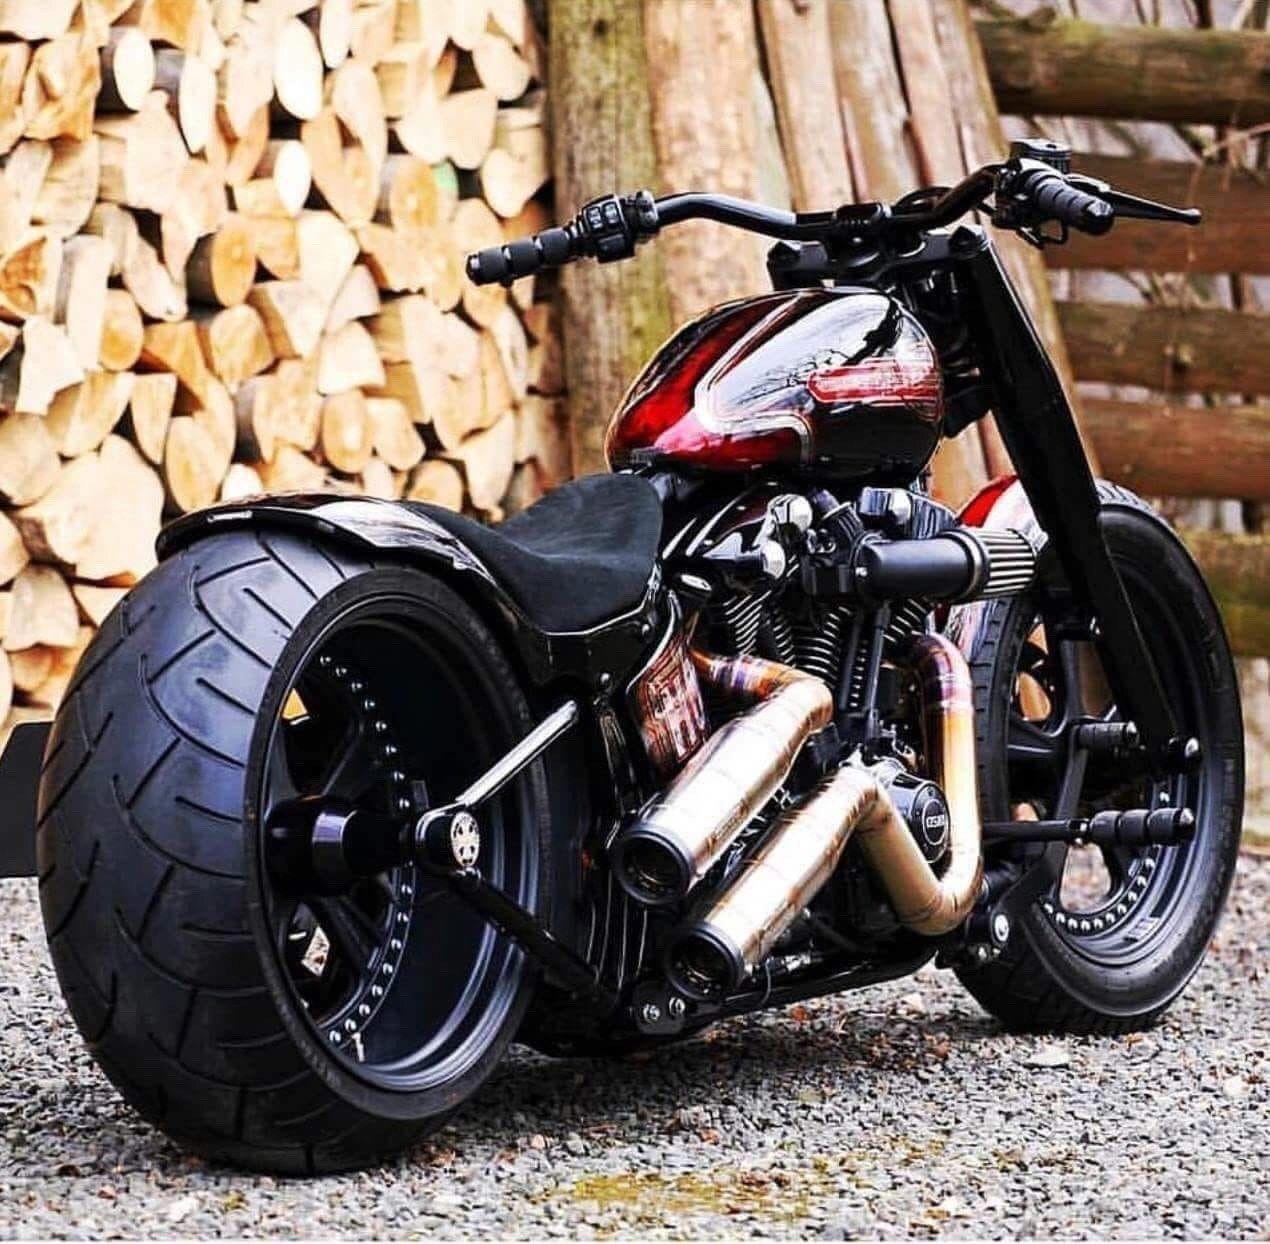 Harley Davidson Custom Bobber Harleydavidsoncustom Motorcycle Harley Bobber Motorcycle Custom Bobber